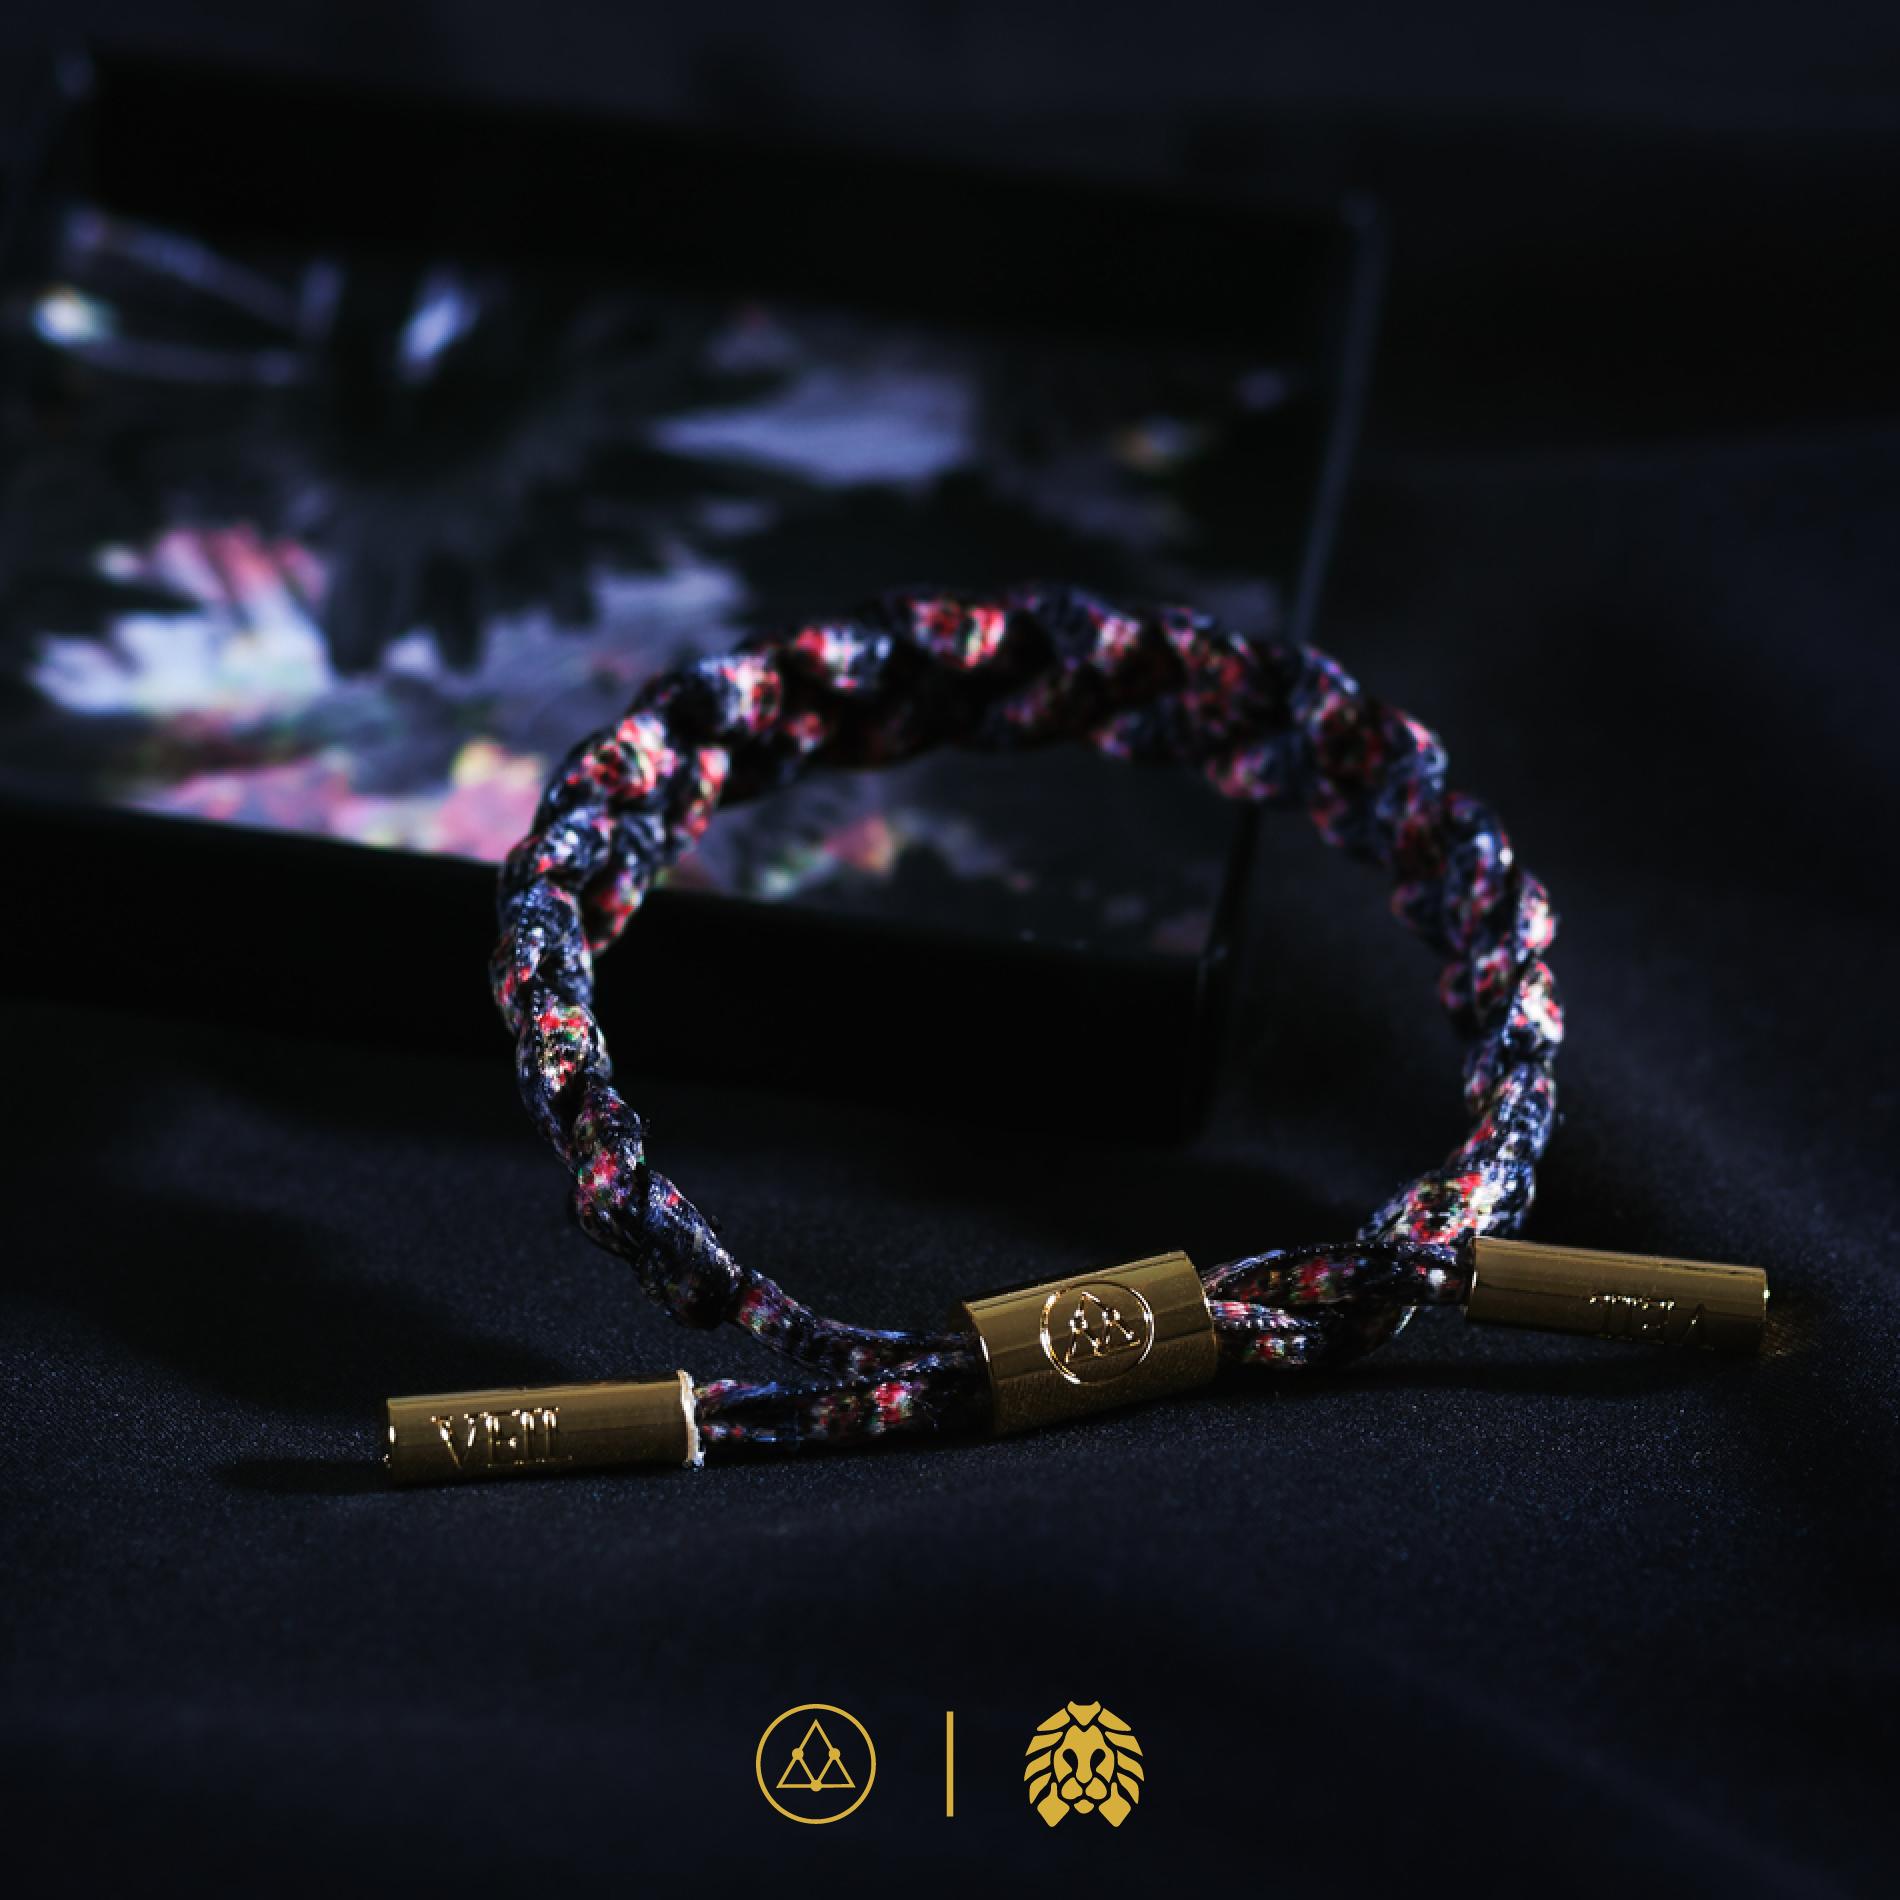 Rastaclat x VEIL 經典黑花卉 鞋帶手鏈 合作限量款